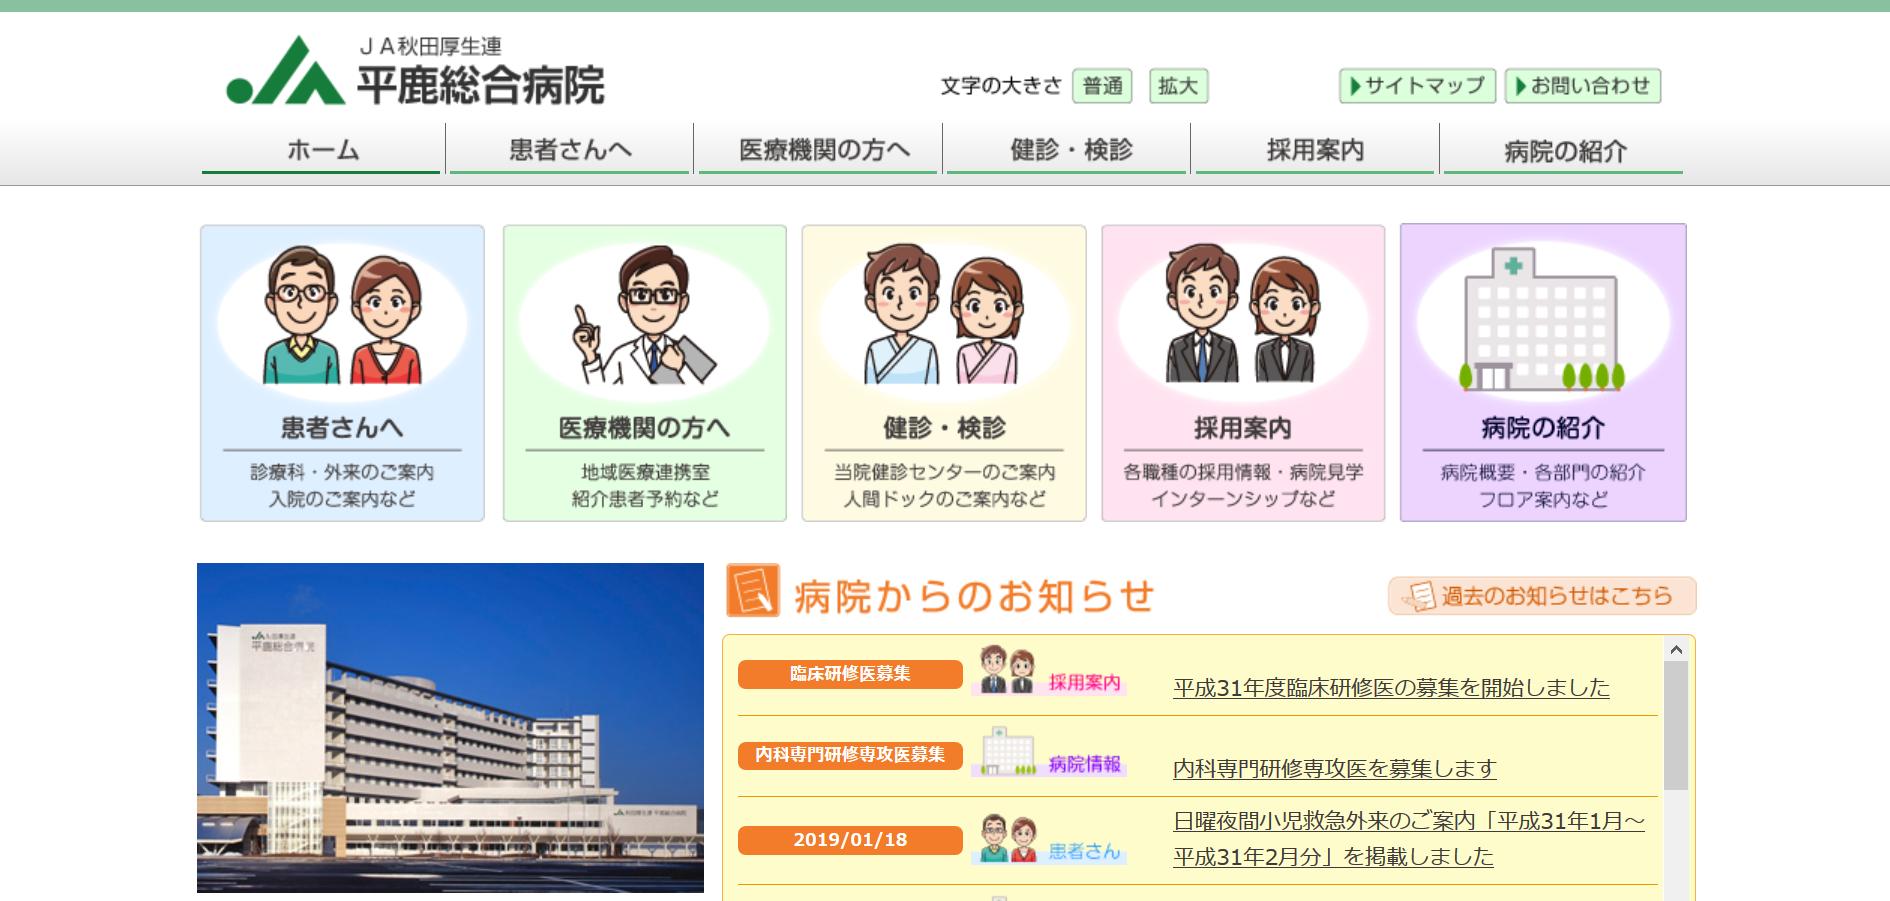 JA秋田厚生連 平鹿総合病院の働きやすさ・評判は?